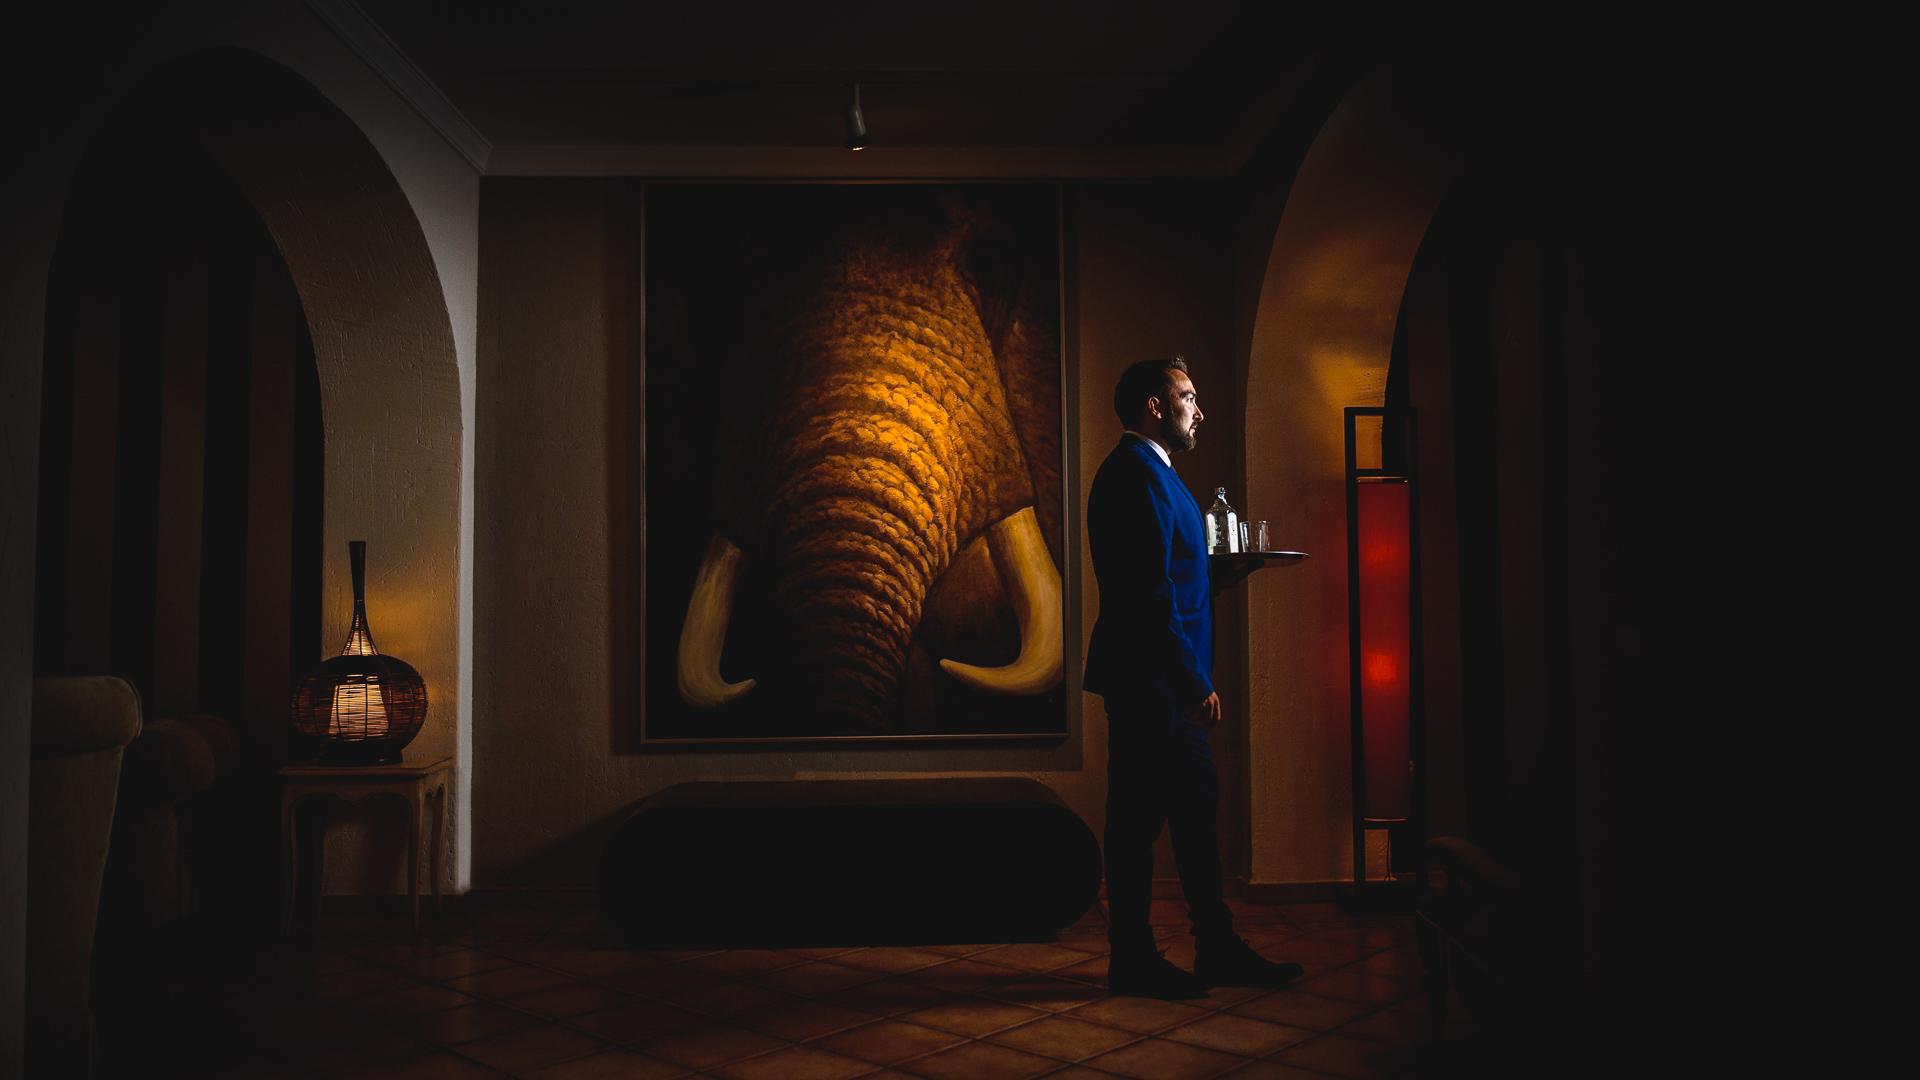 fotógrafo de interiorismo, hotel la viñuela